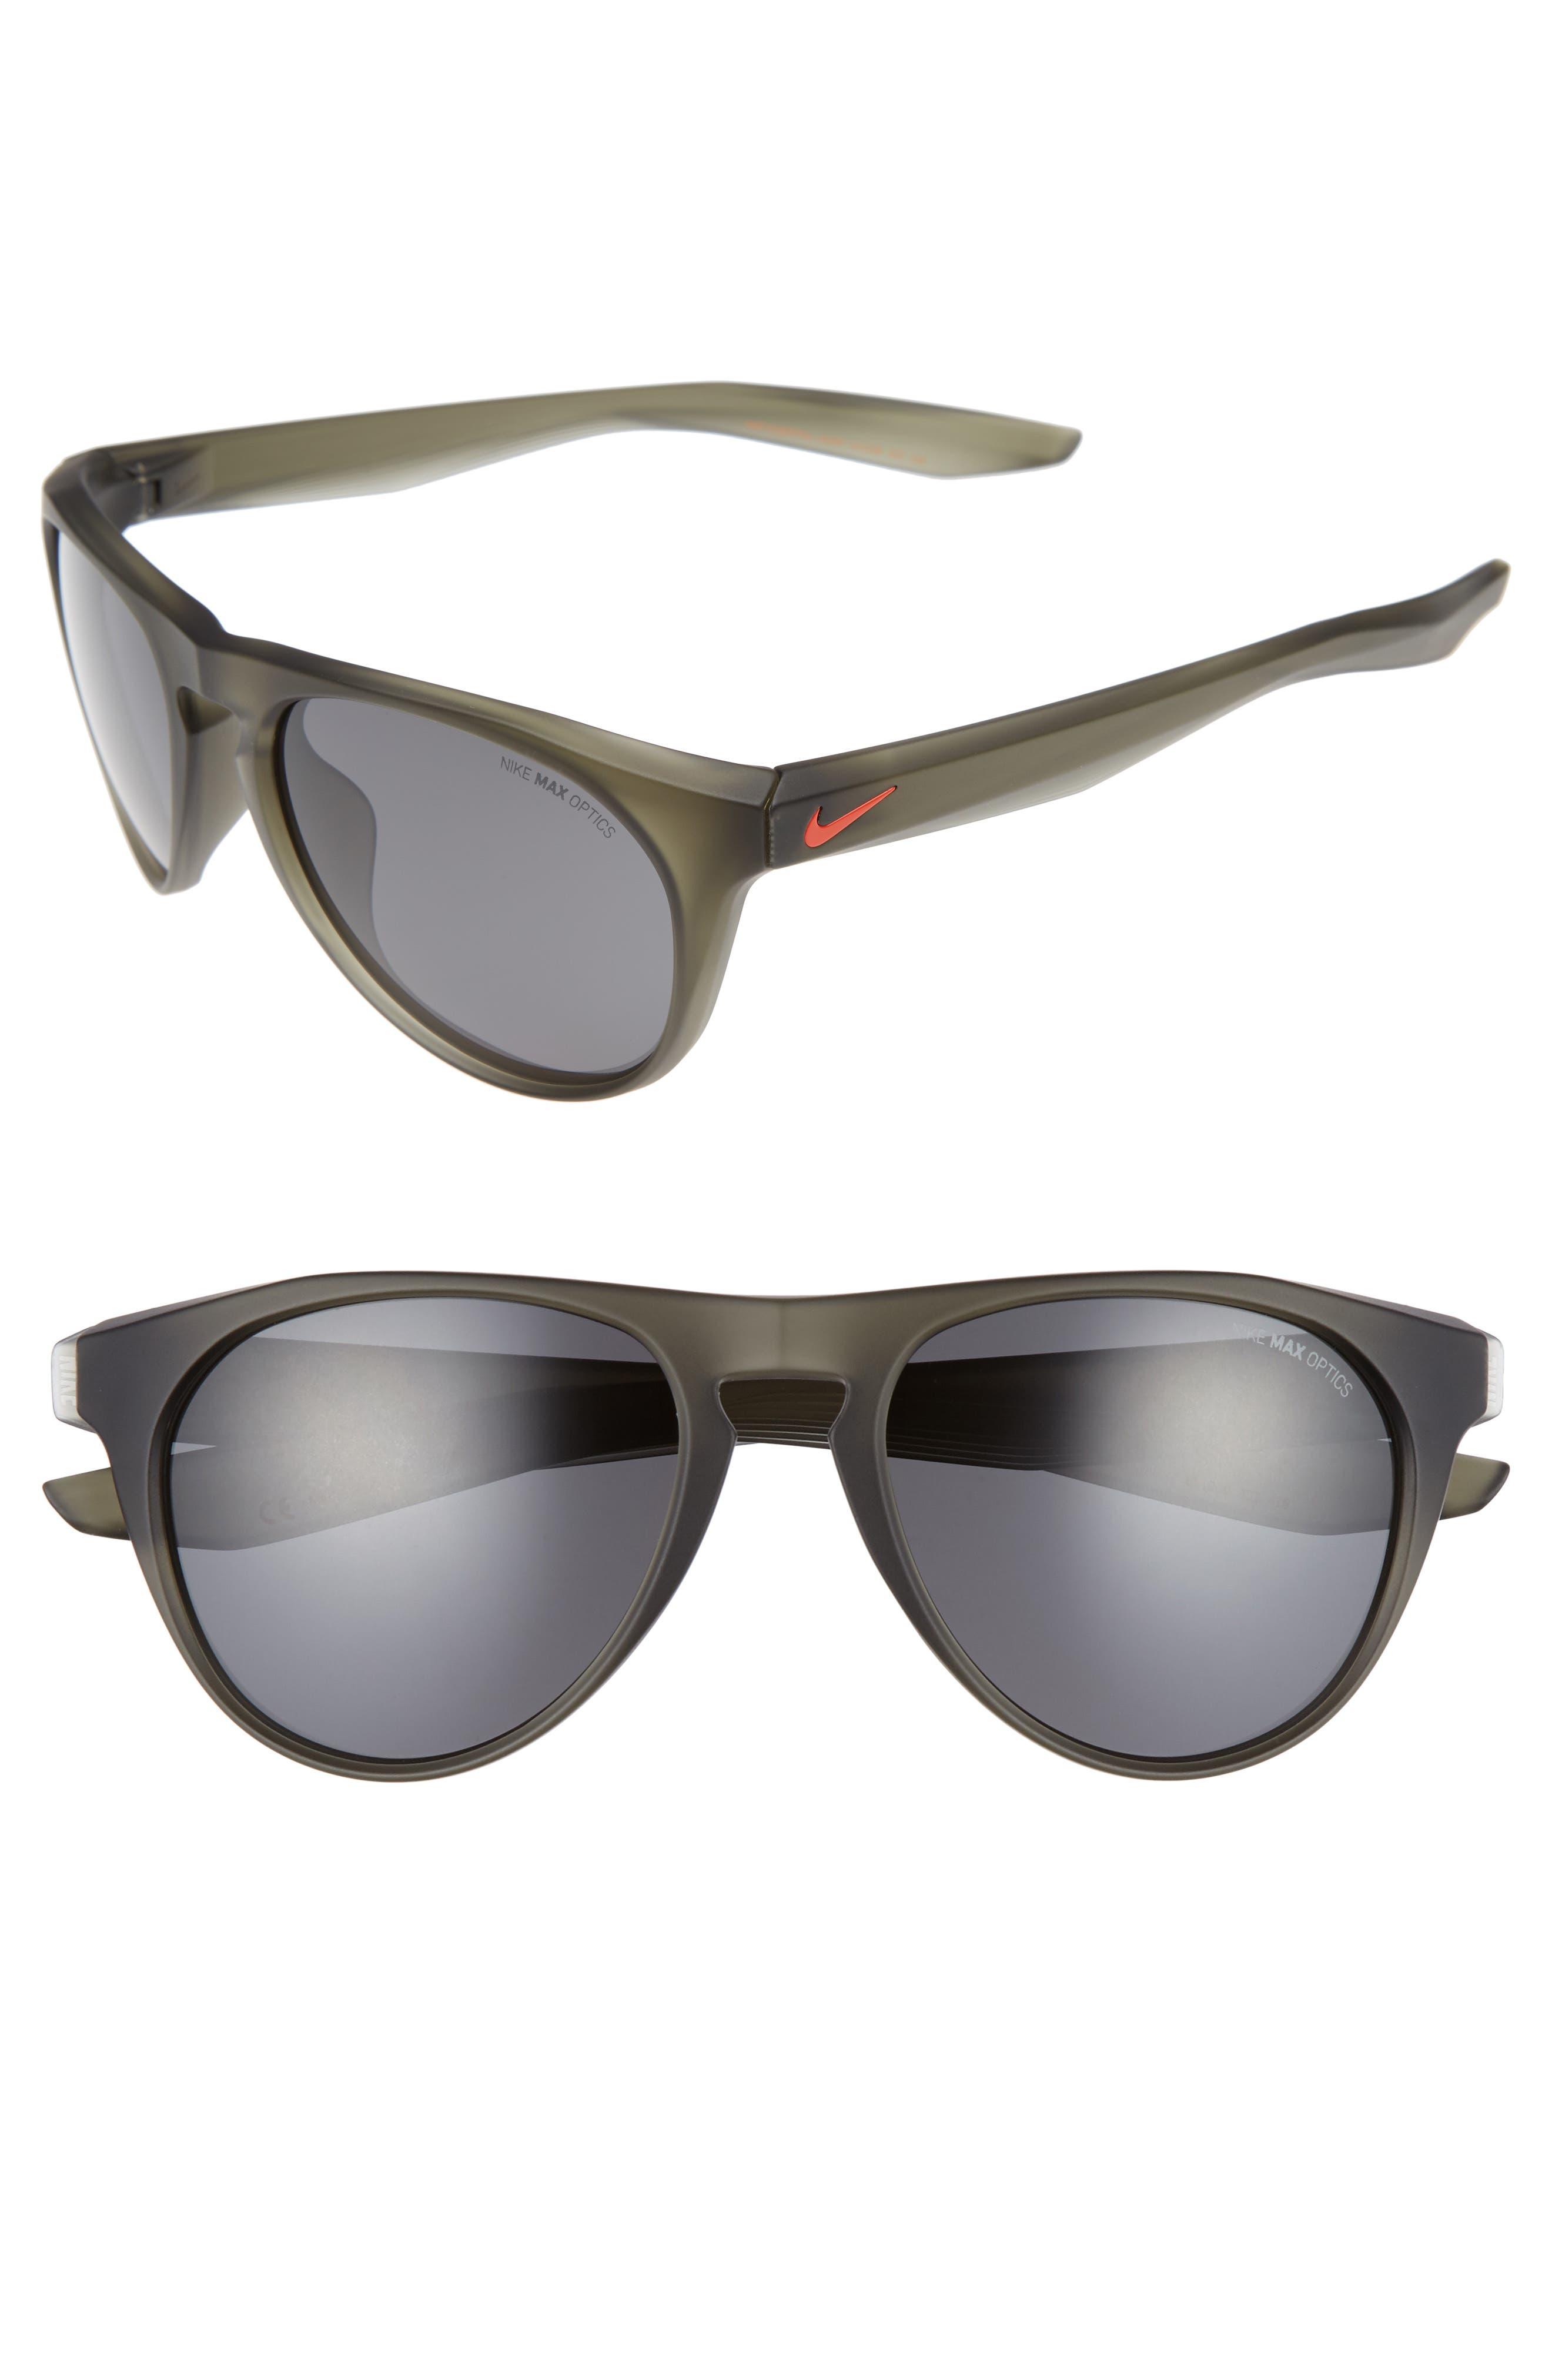 Essential Jaunt 56mm Sunglasses,                             Main thumbnail 1, color,                             Matte Cargo Khaki